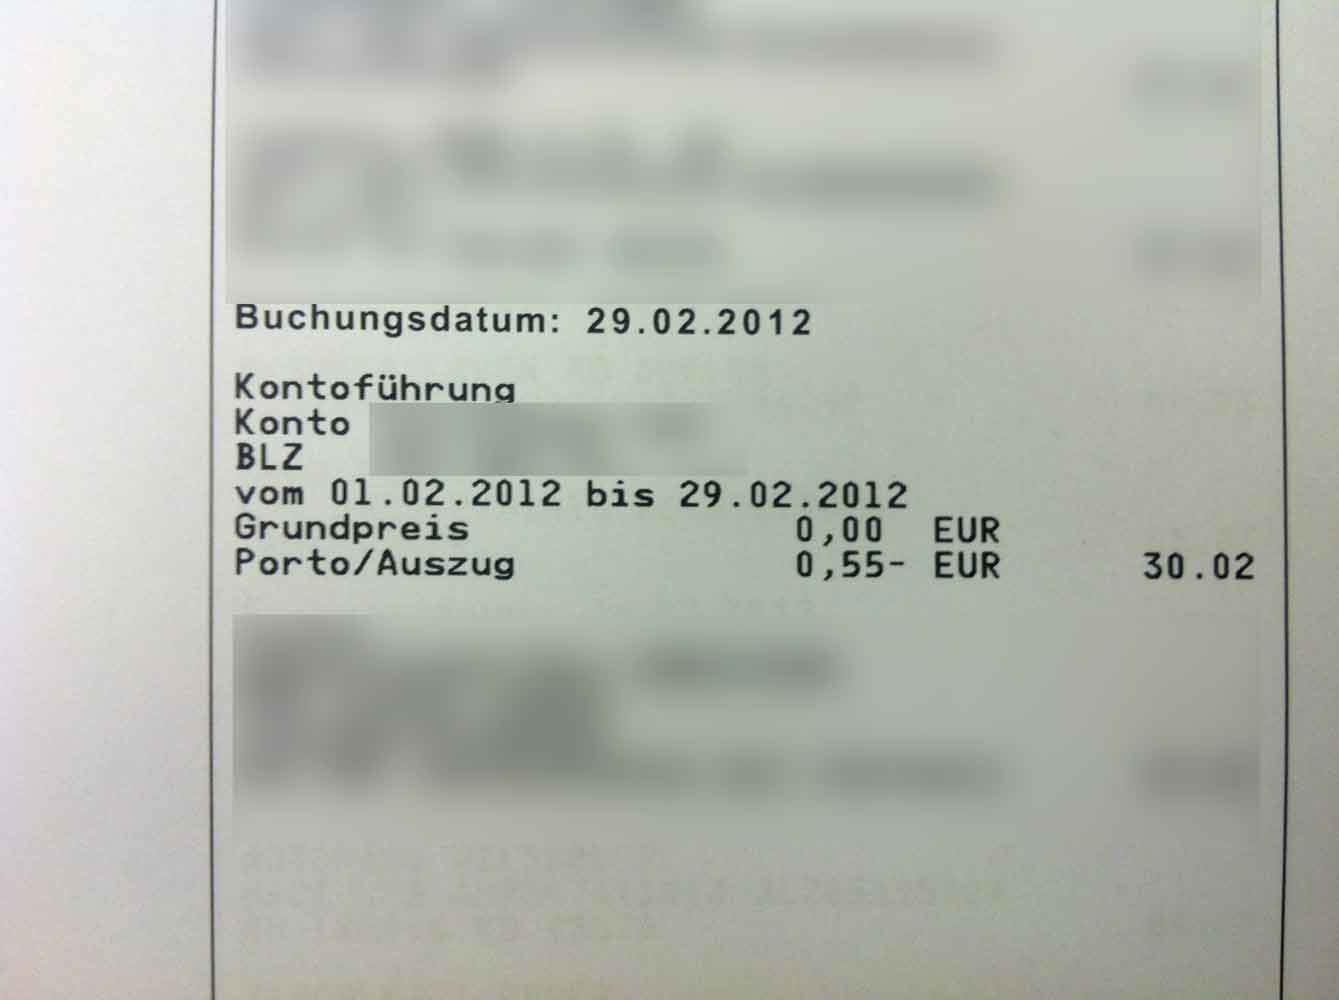 KontogebГјhren Commerzbank